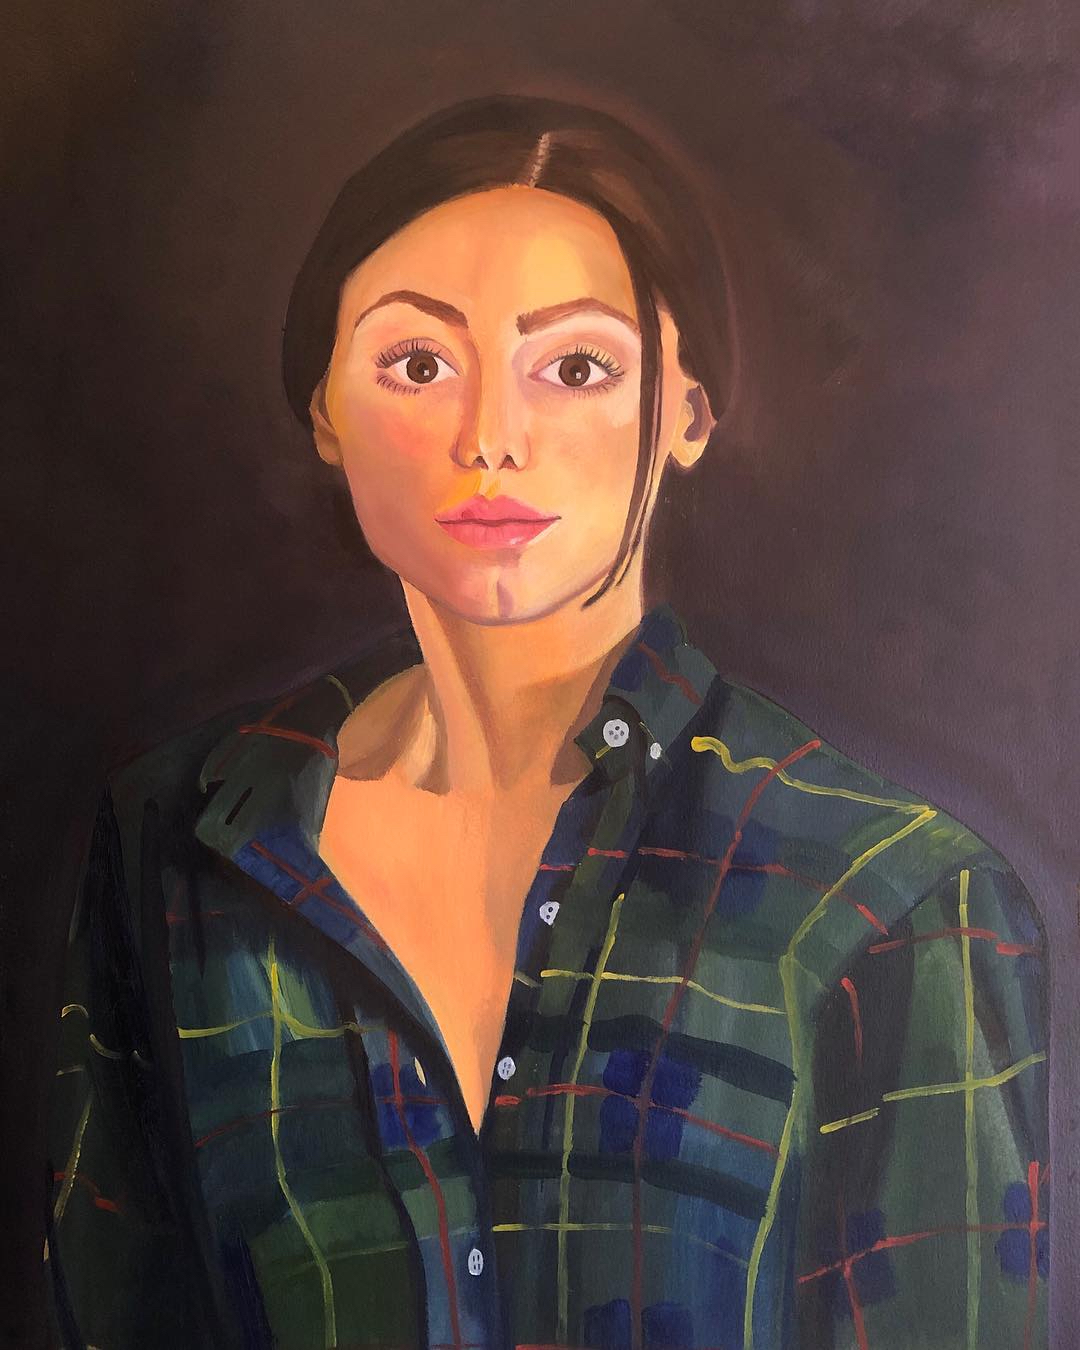 katrina-eugenia-oil-on-canvas-watercolor-painting-nyc-artist-painter-fairmount-laundry-art51.jpg